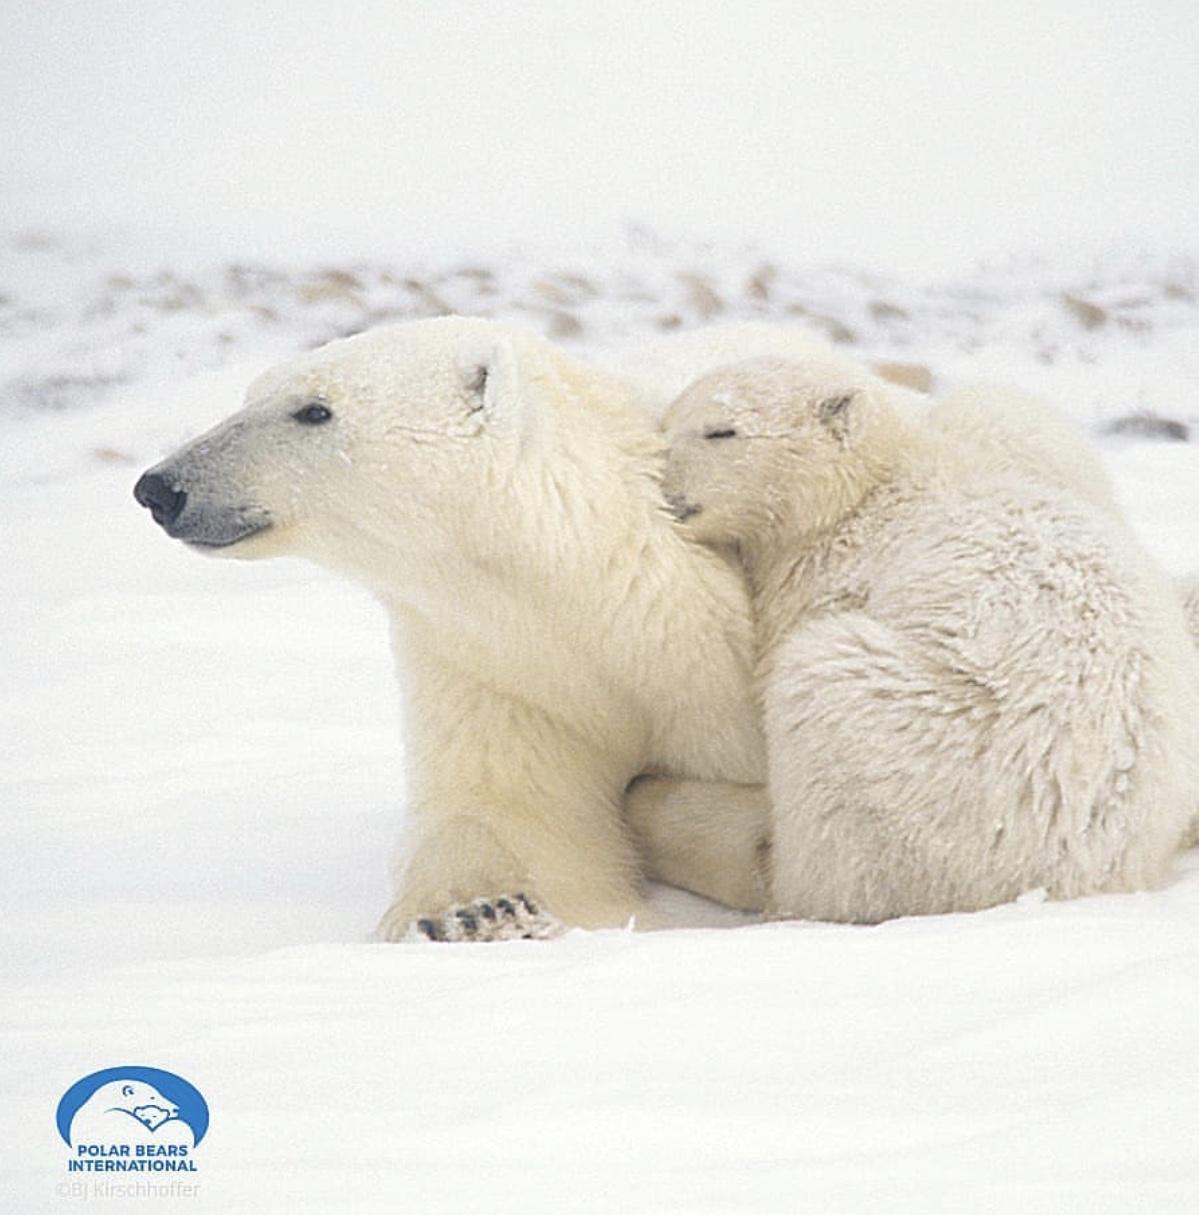 Mama polar bear and her cub (photo by   @polarbearsinternational   )